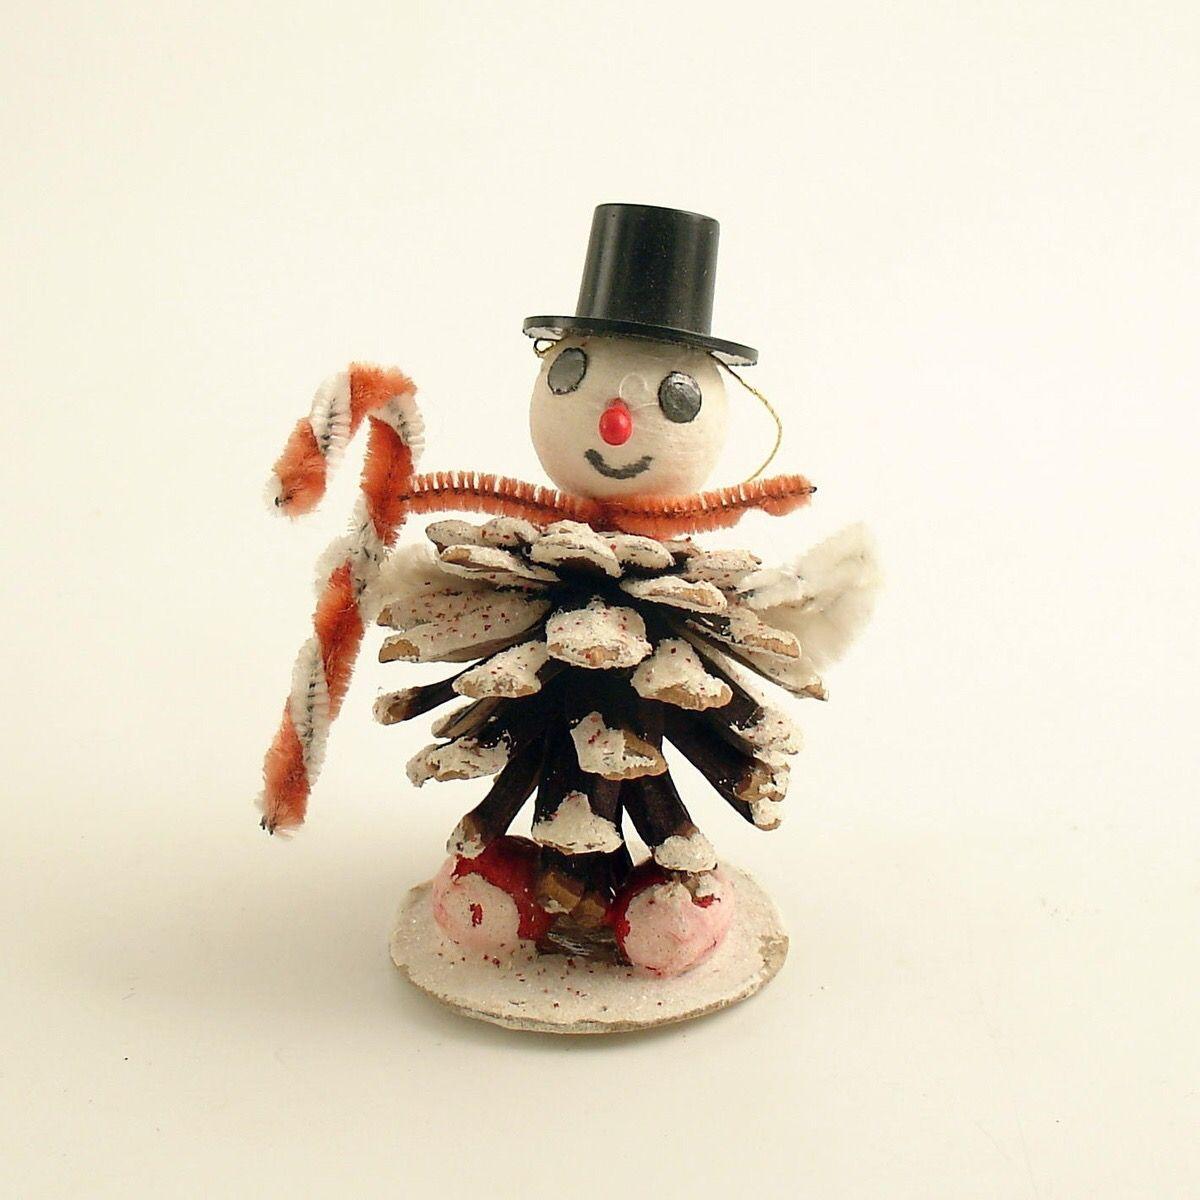 Vintage Pinecone Snowman Vintage Christmas Vintage Christmas Ornaments Vintage Christmas Decorations